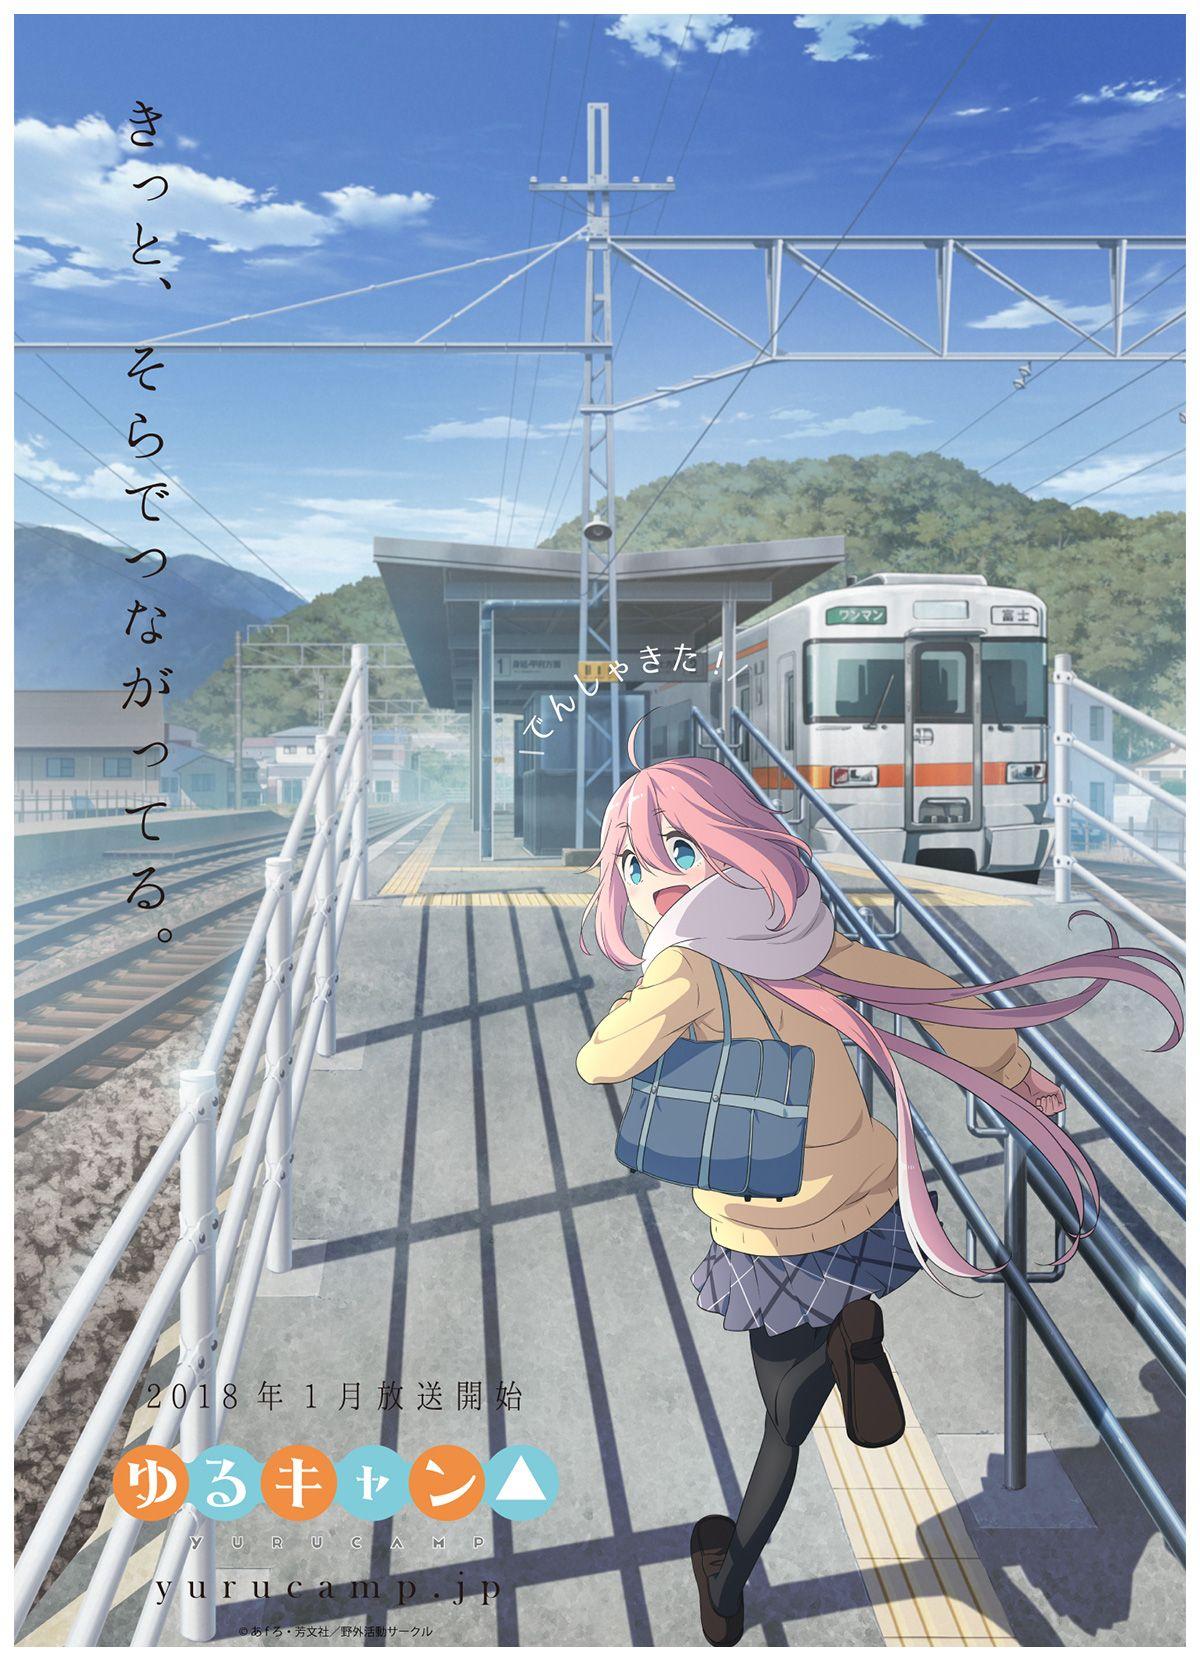 Unduh 860+ Wallpaper Hd Yuru Camp Gambar Terbaik